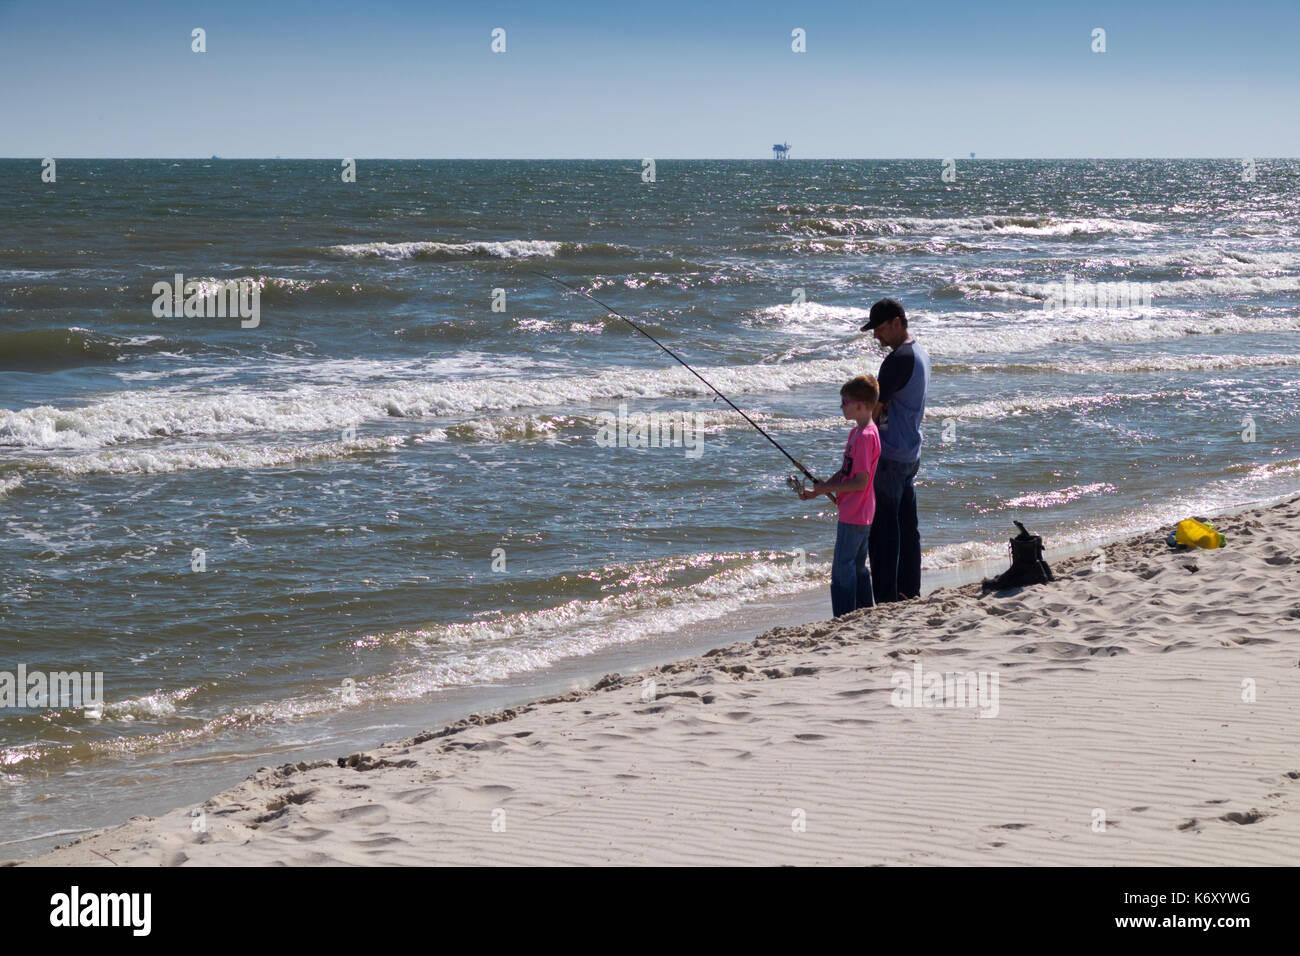 Alabama fishing stock photos alabama fishing stock for Gulf shores alabama fishing